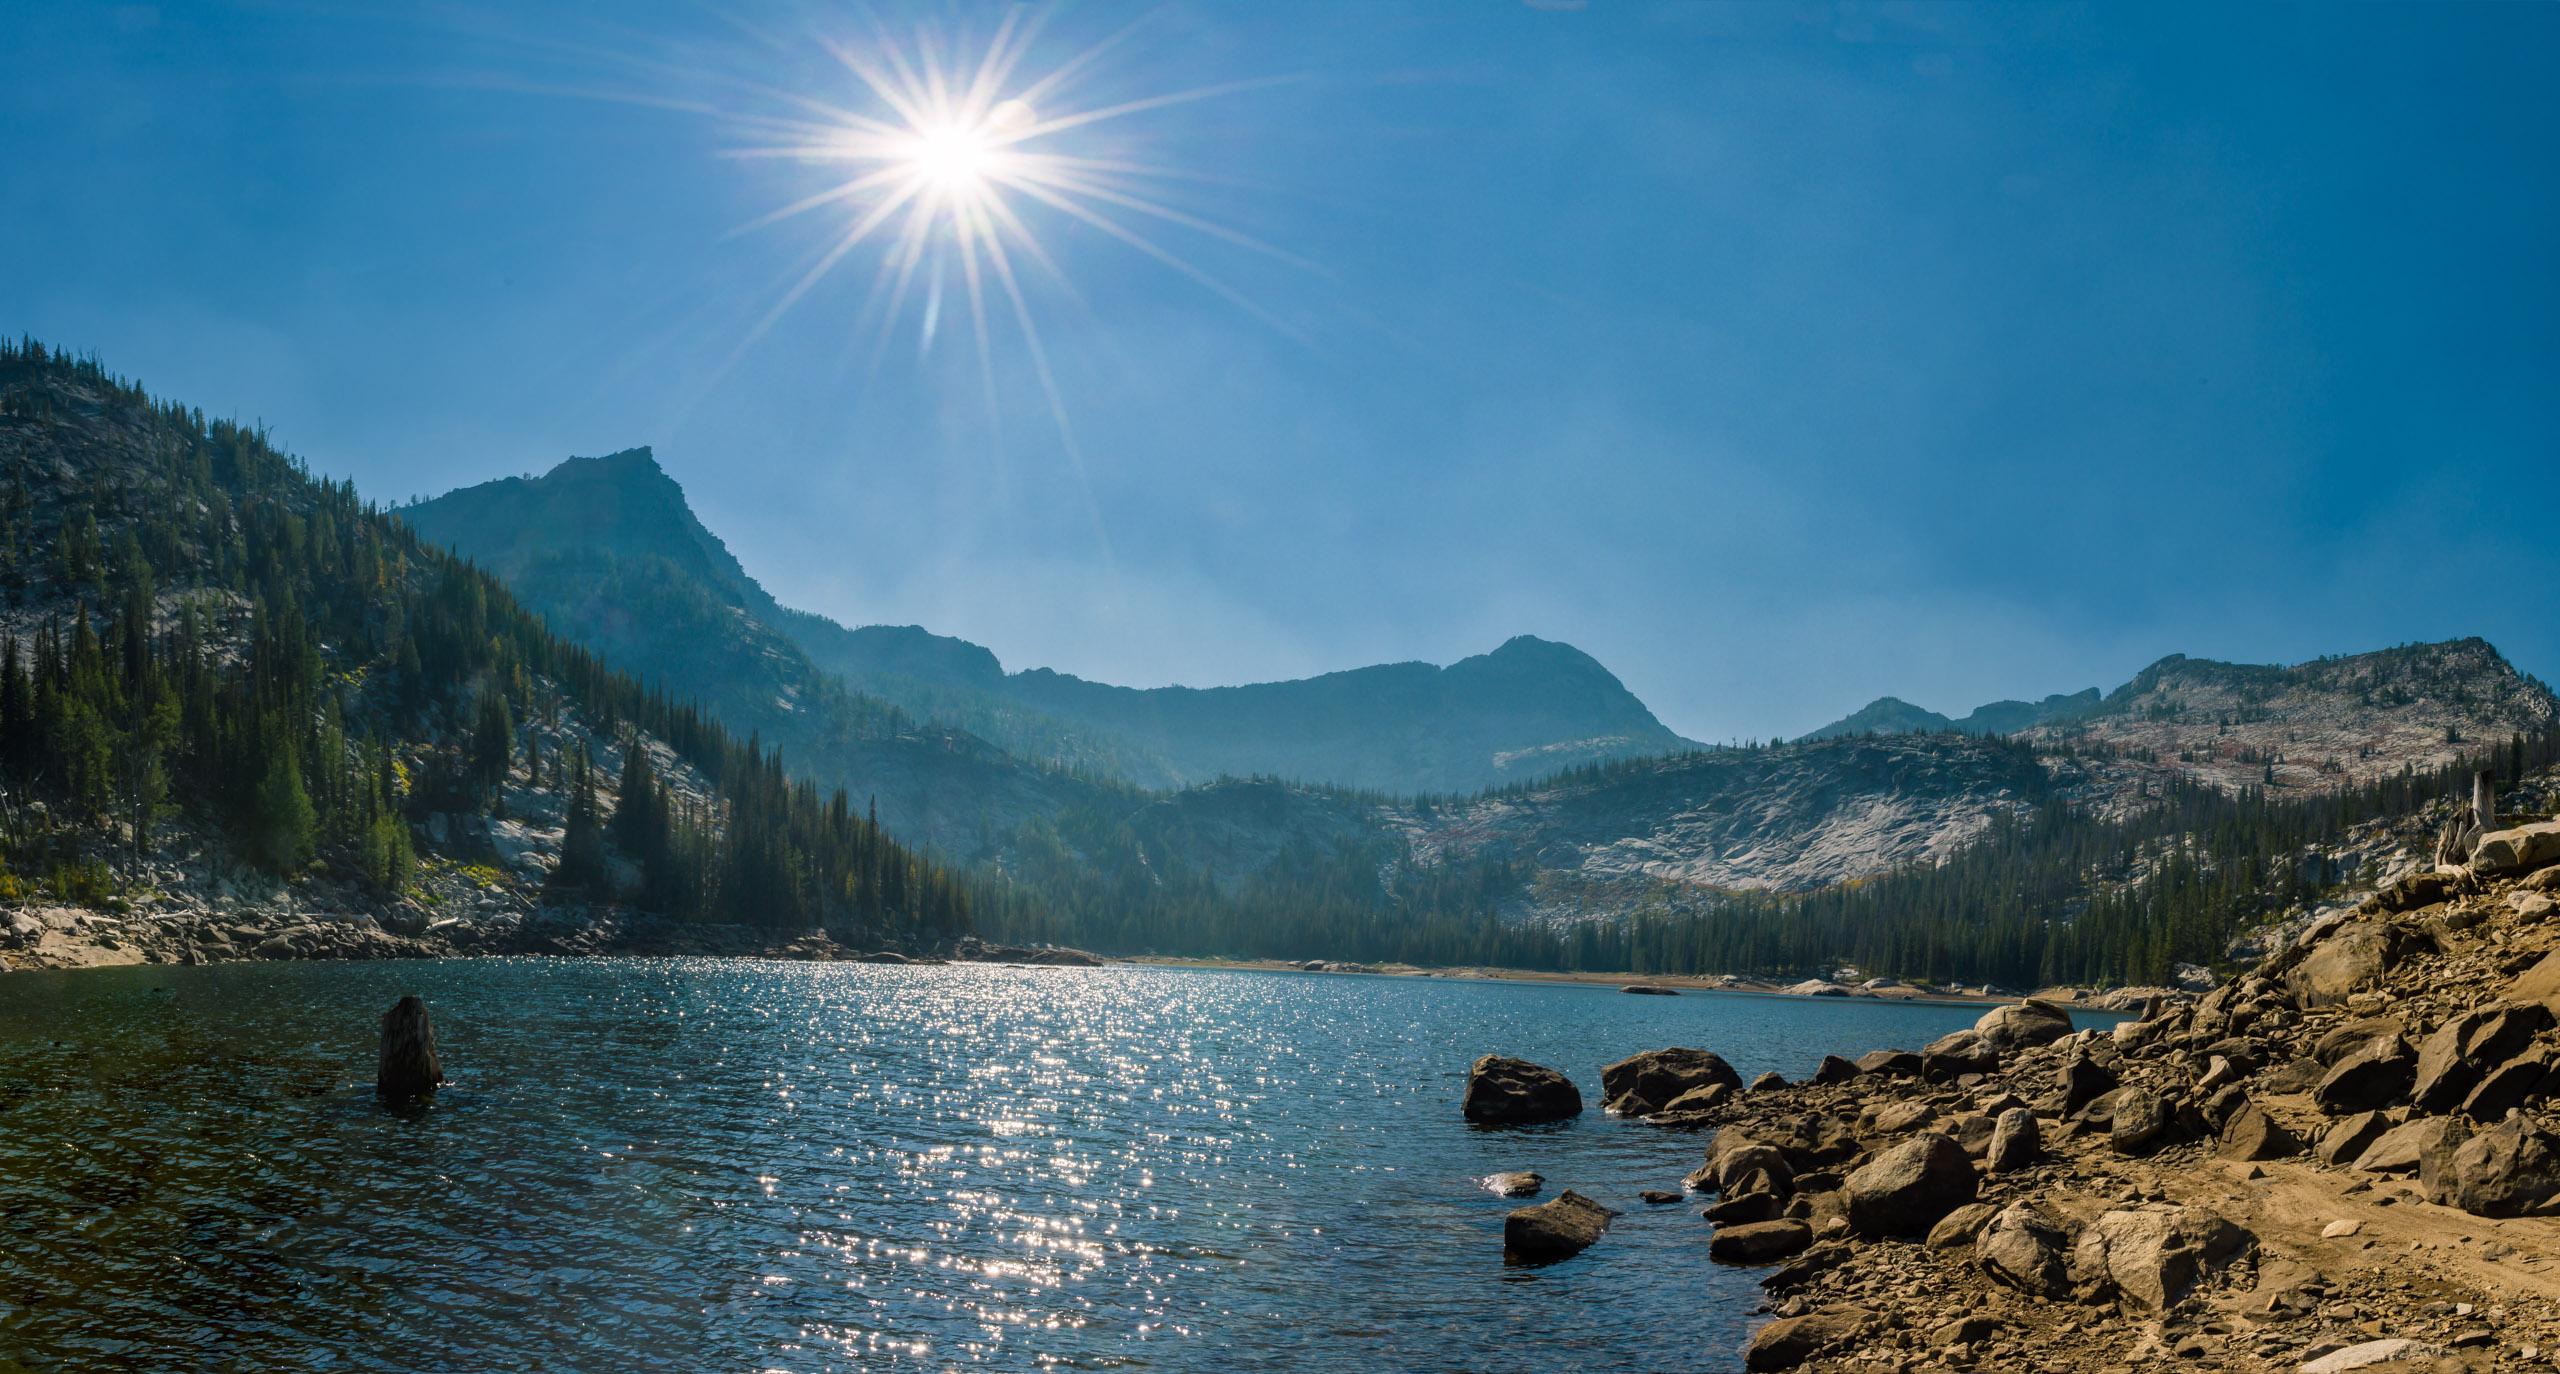 Canyon Lake was drawn down considerably